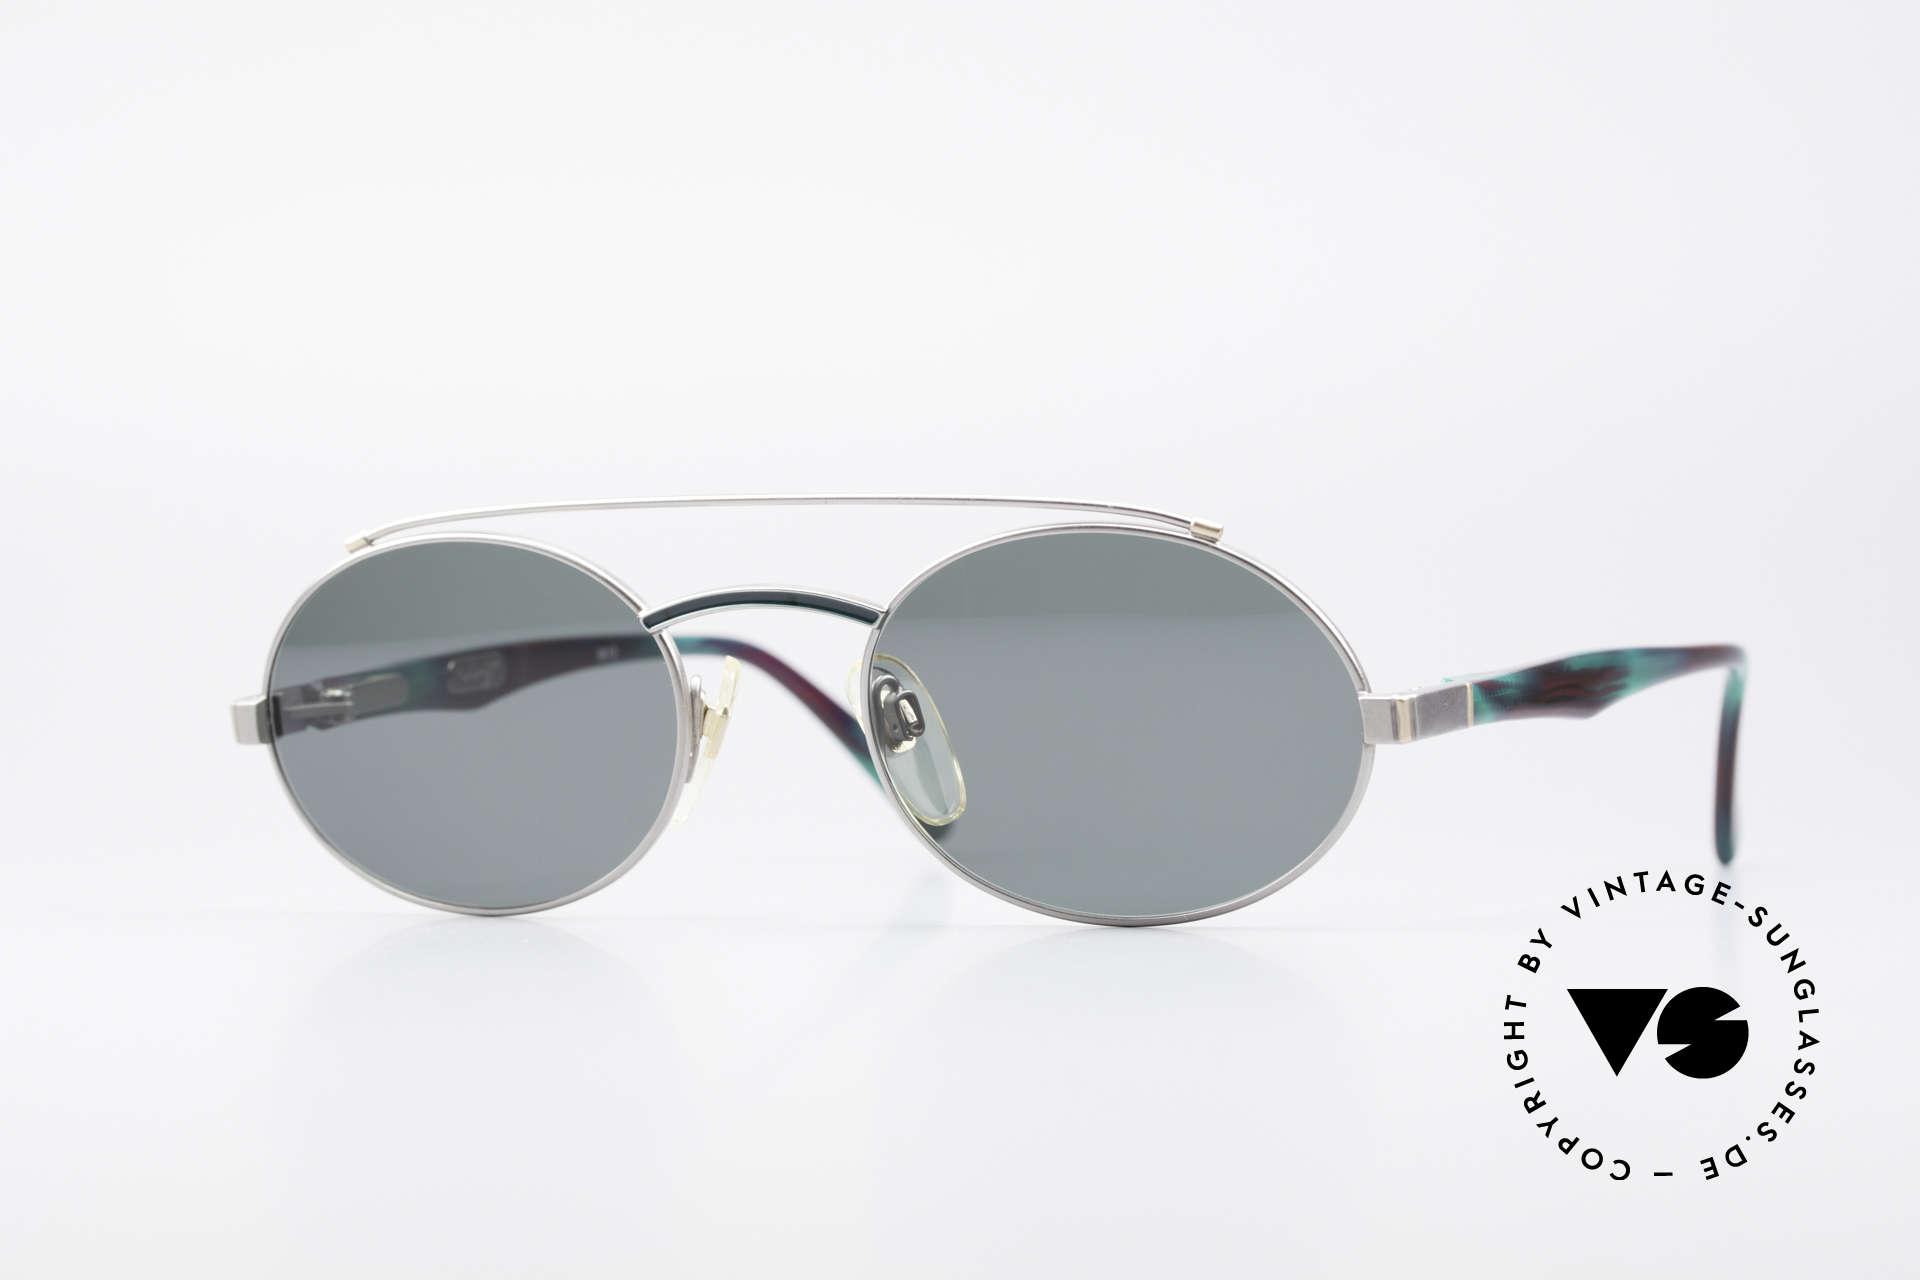 Davidoff 305 Ovale Vintage Herrenbrille, edle vintage 1990er Herren-Sonnenbrille von DAVIDOFF, Passend für Herren